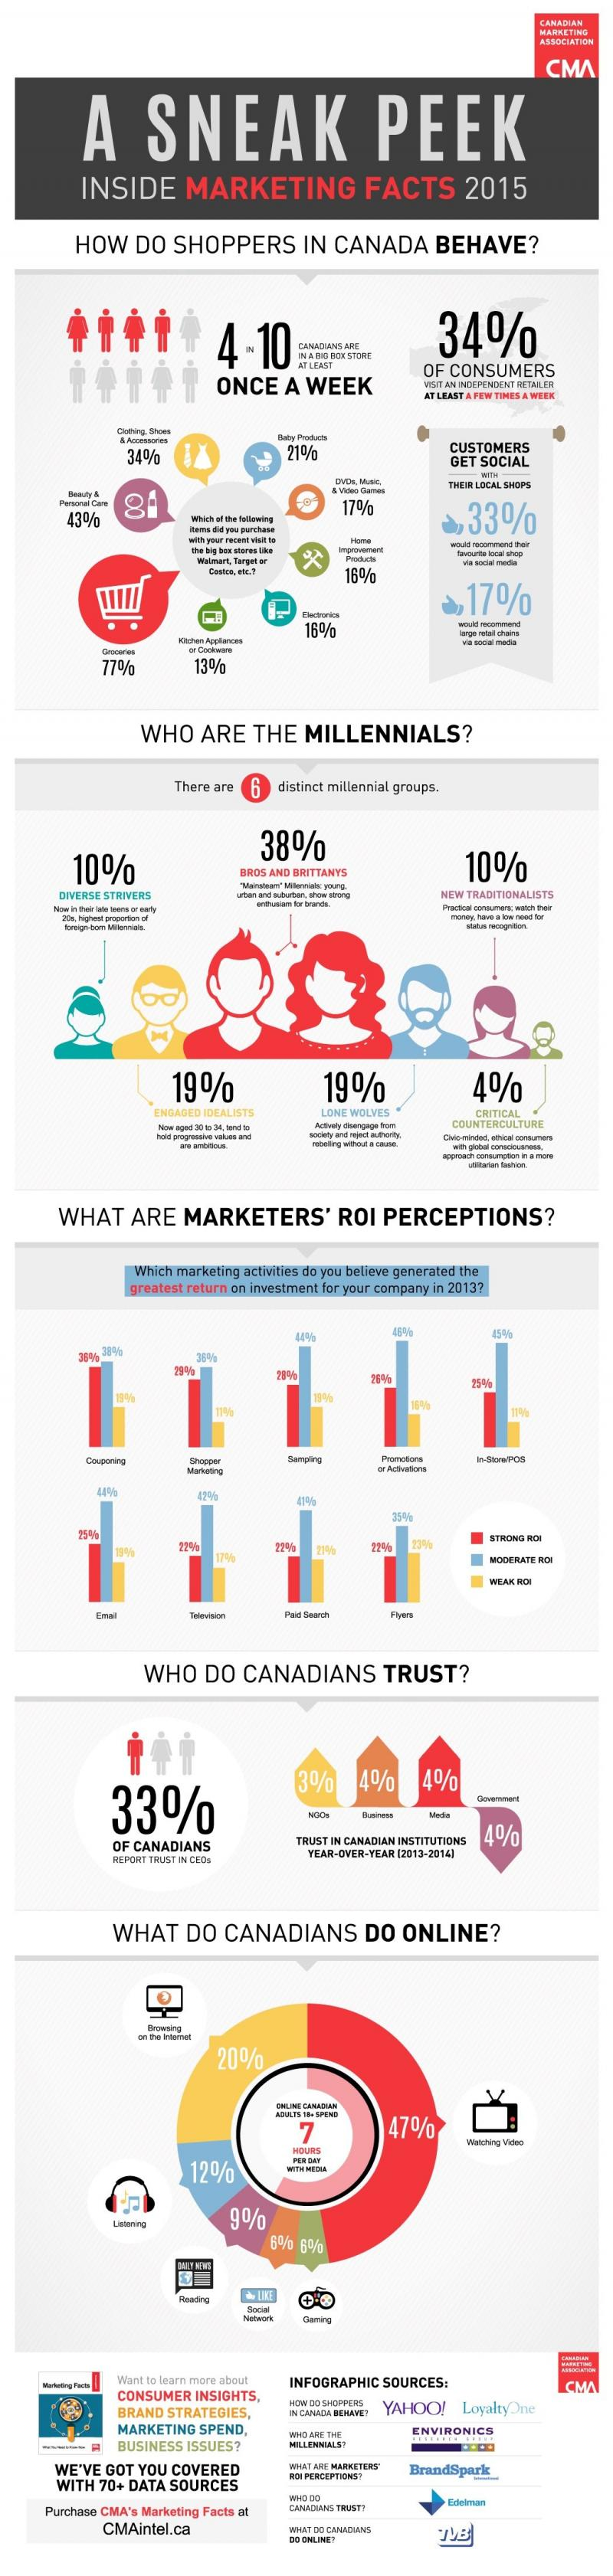 Different Species of Millennials #Infographic